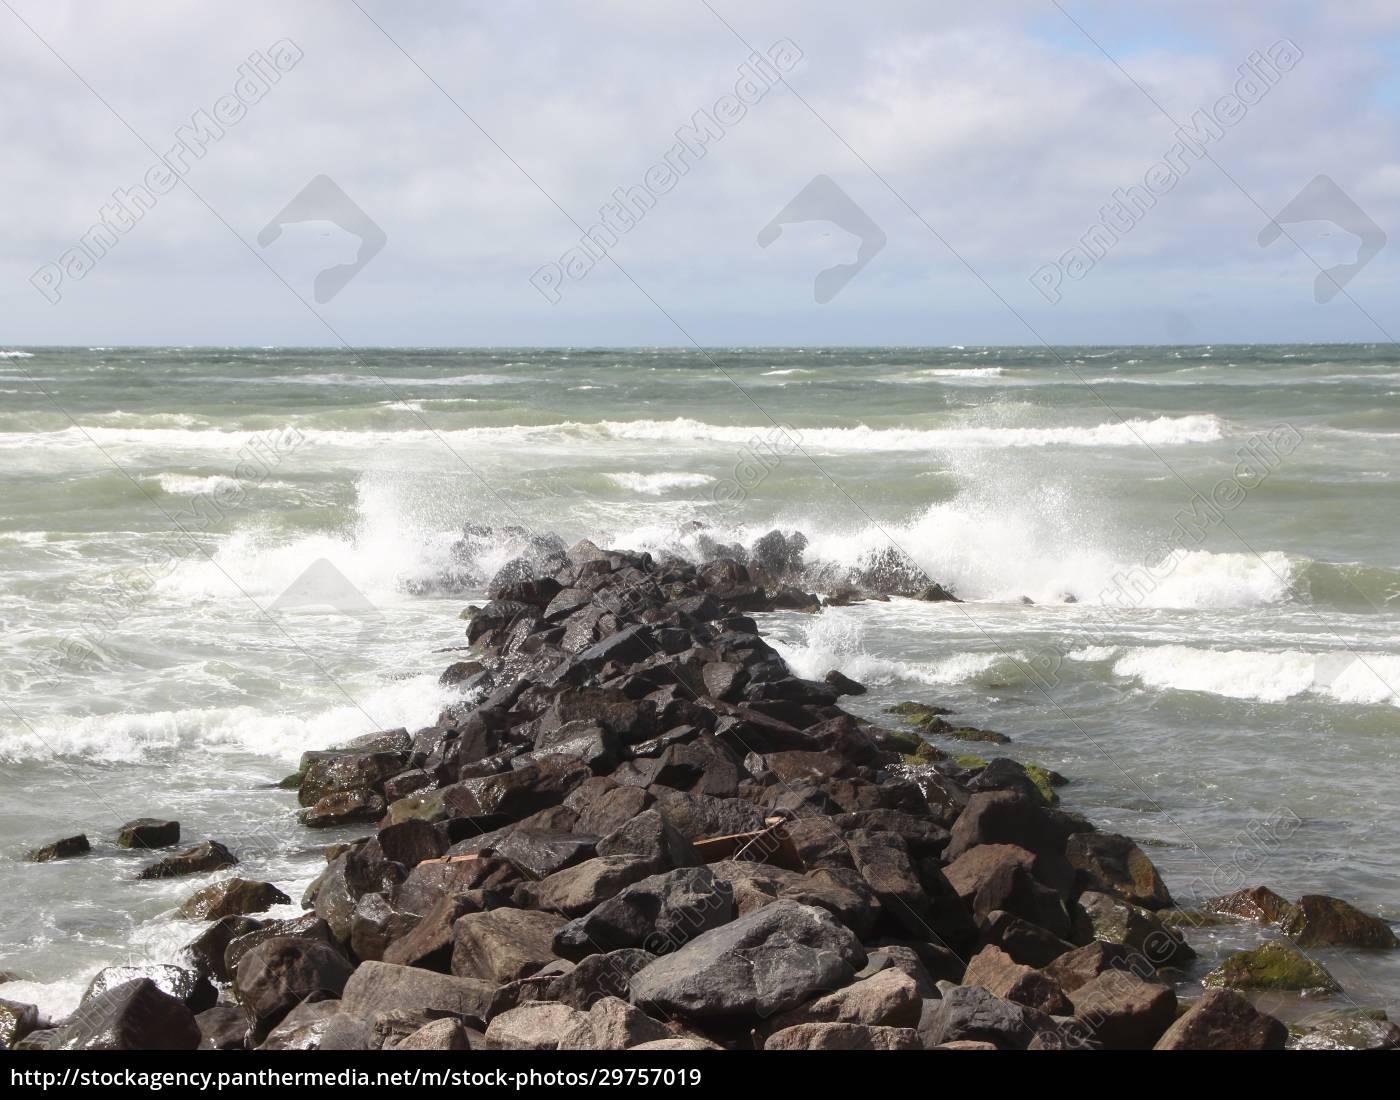 solid, breakwater, rocks, with, cloudy, ocean - 29757019